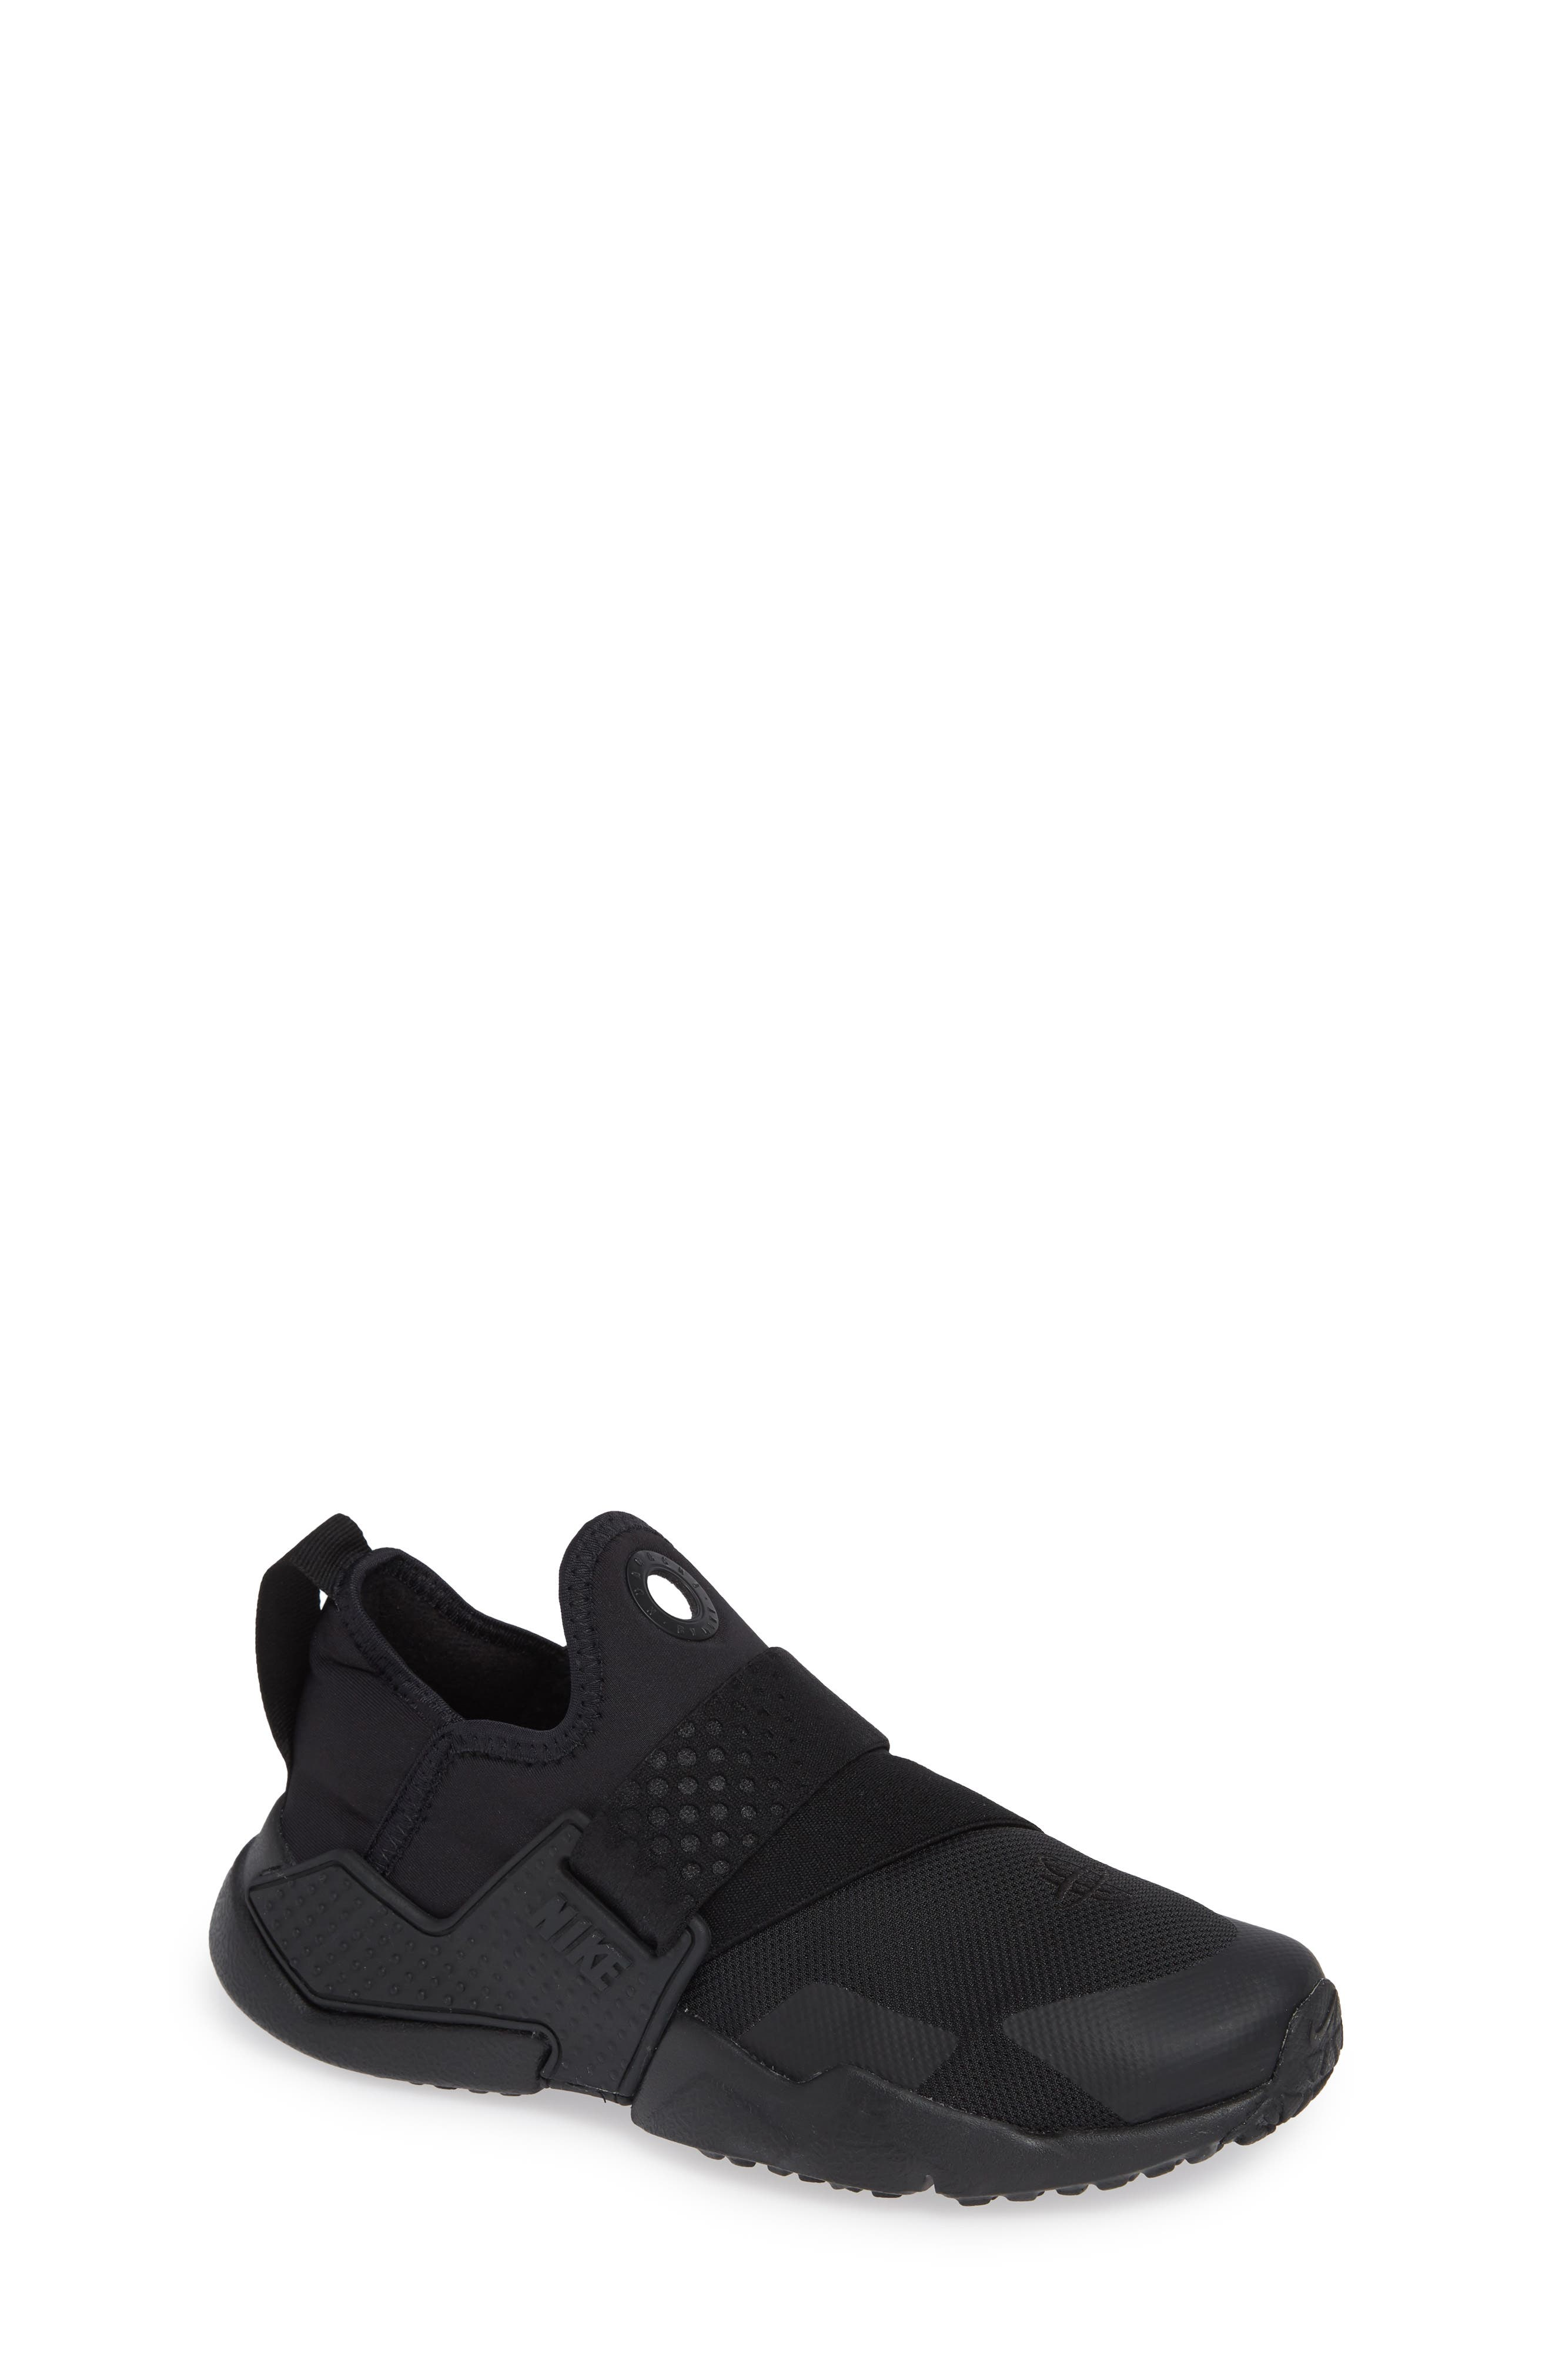 Nike Boys Extreme Huarache Shoe